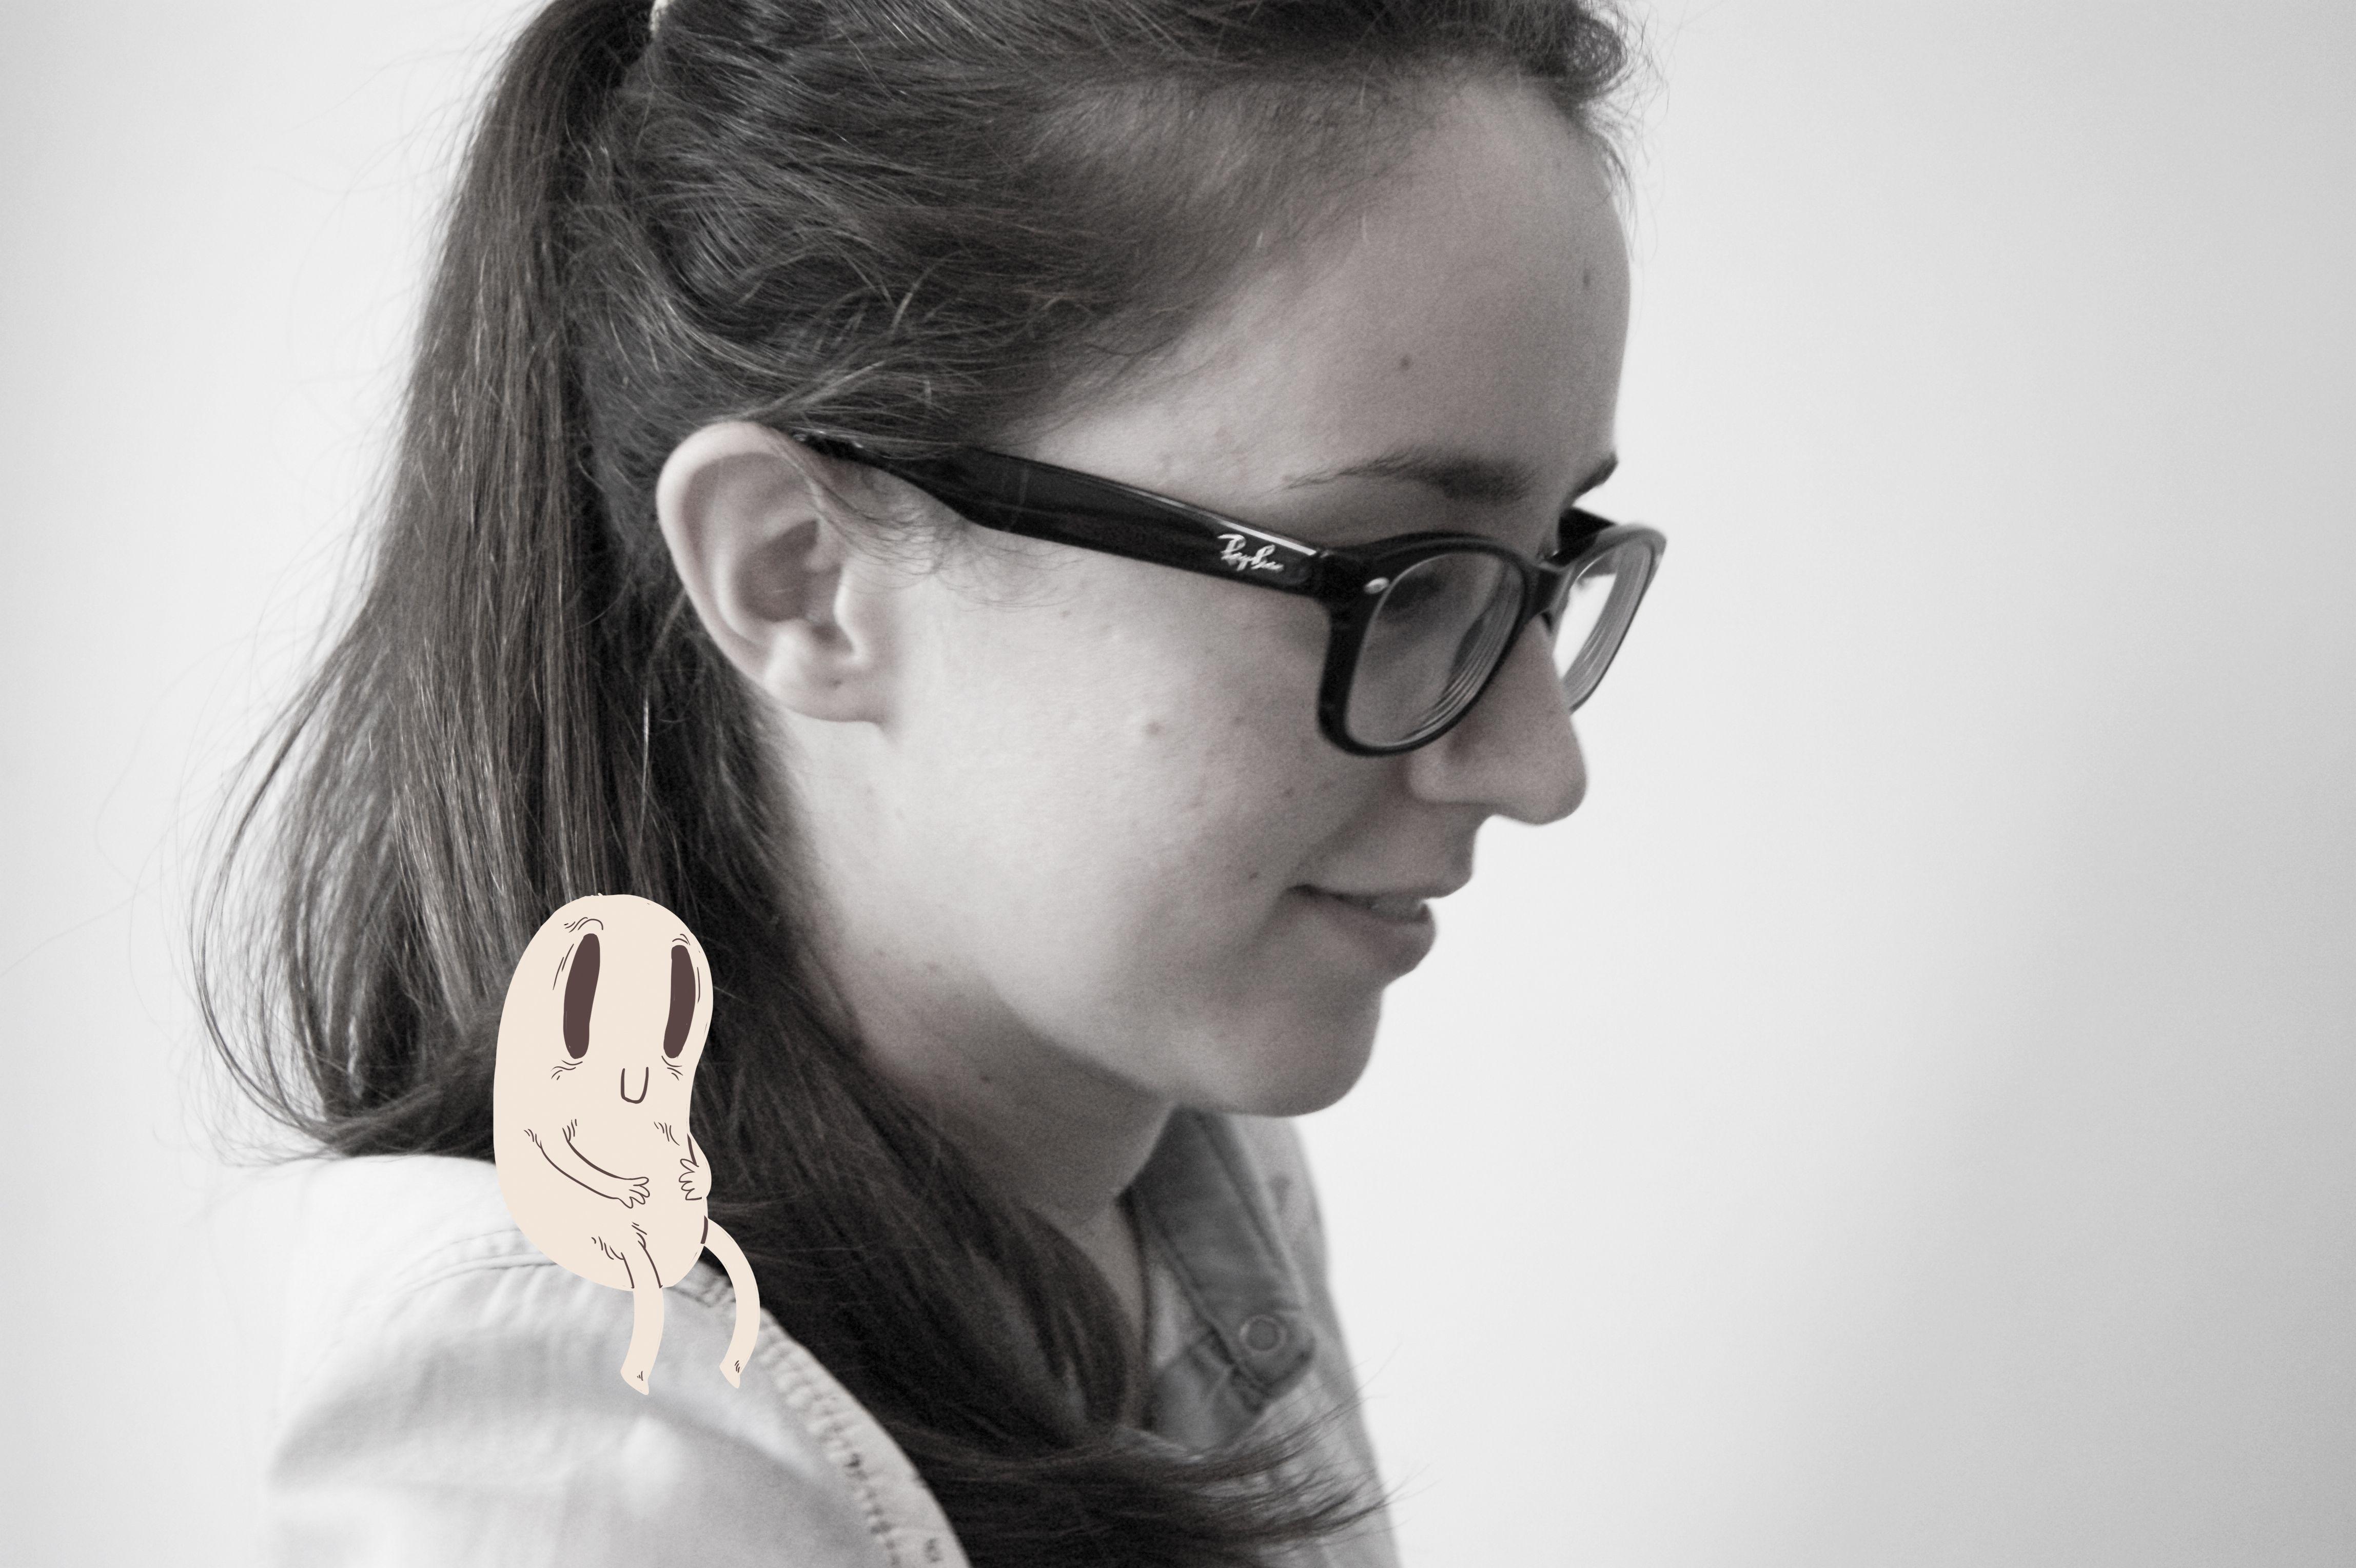 Lourdes Navarro